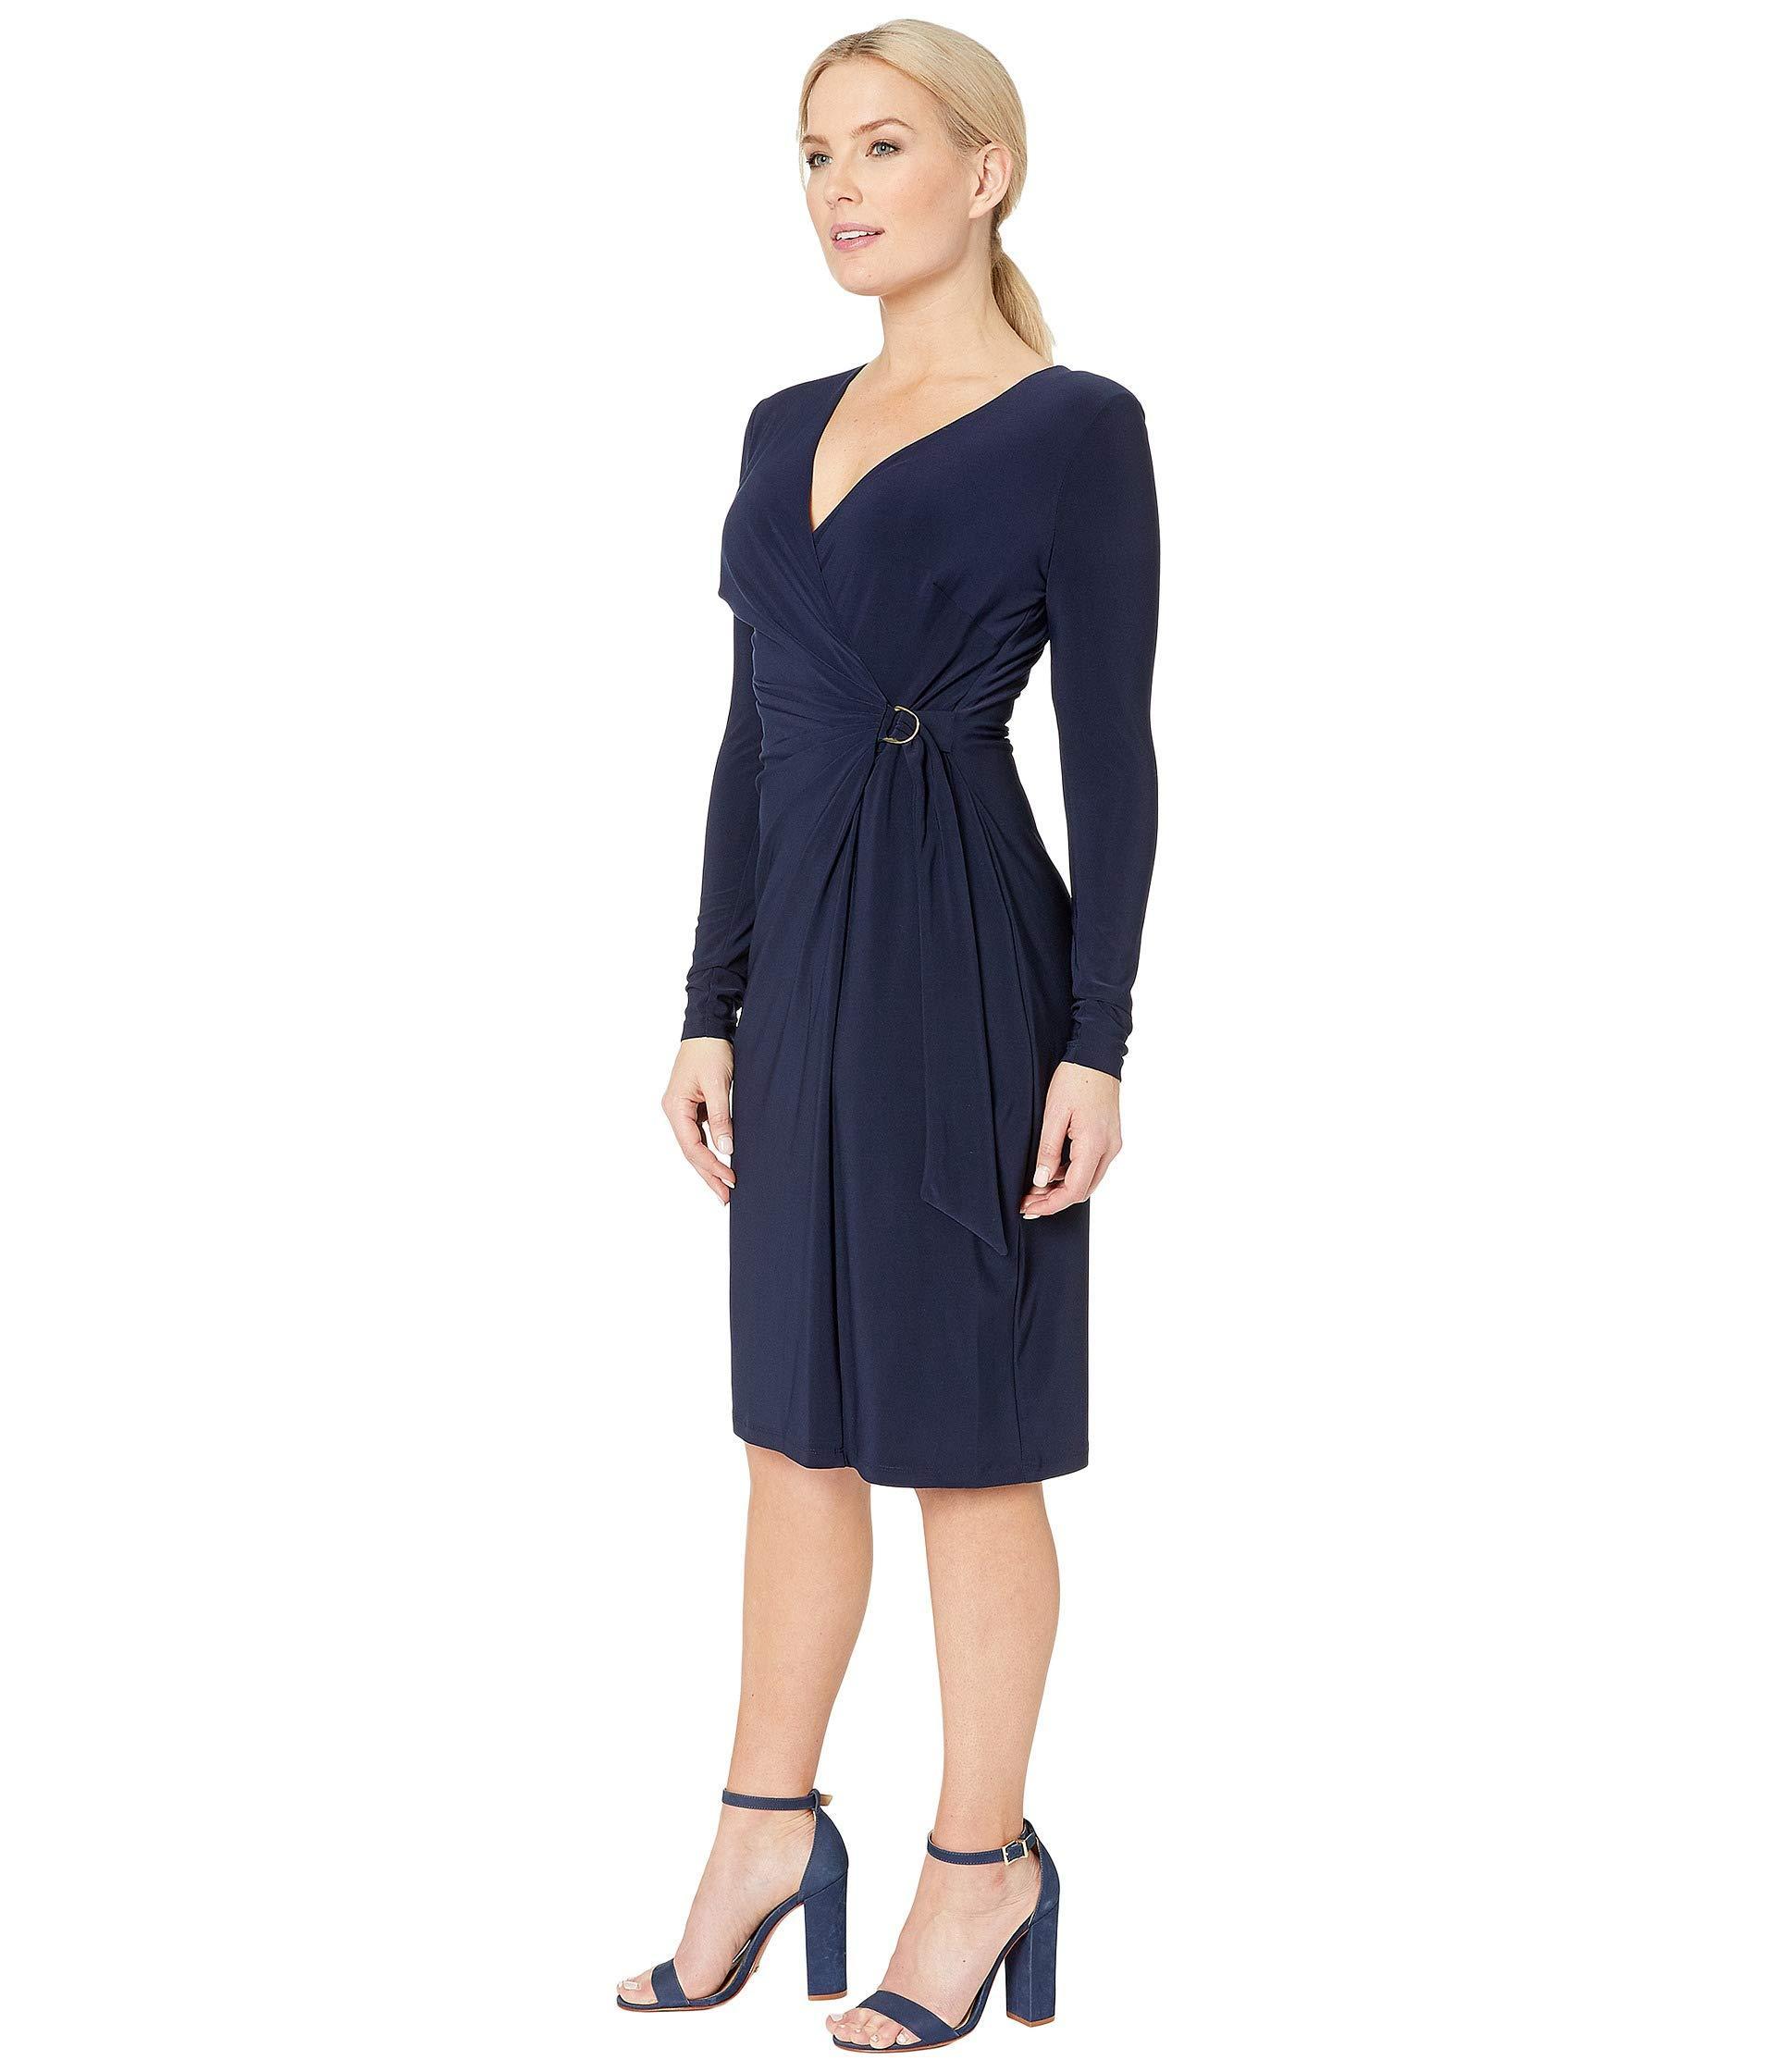 75ea9dd85f1 Lyst - Lauren by Ralph Lauren 1t Matte Jersey Casondra Long Sleeve Day Dress  (navy) Women s Dress in Blue